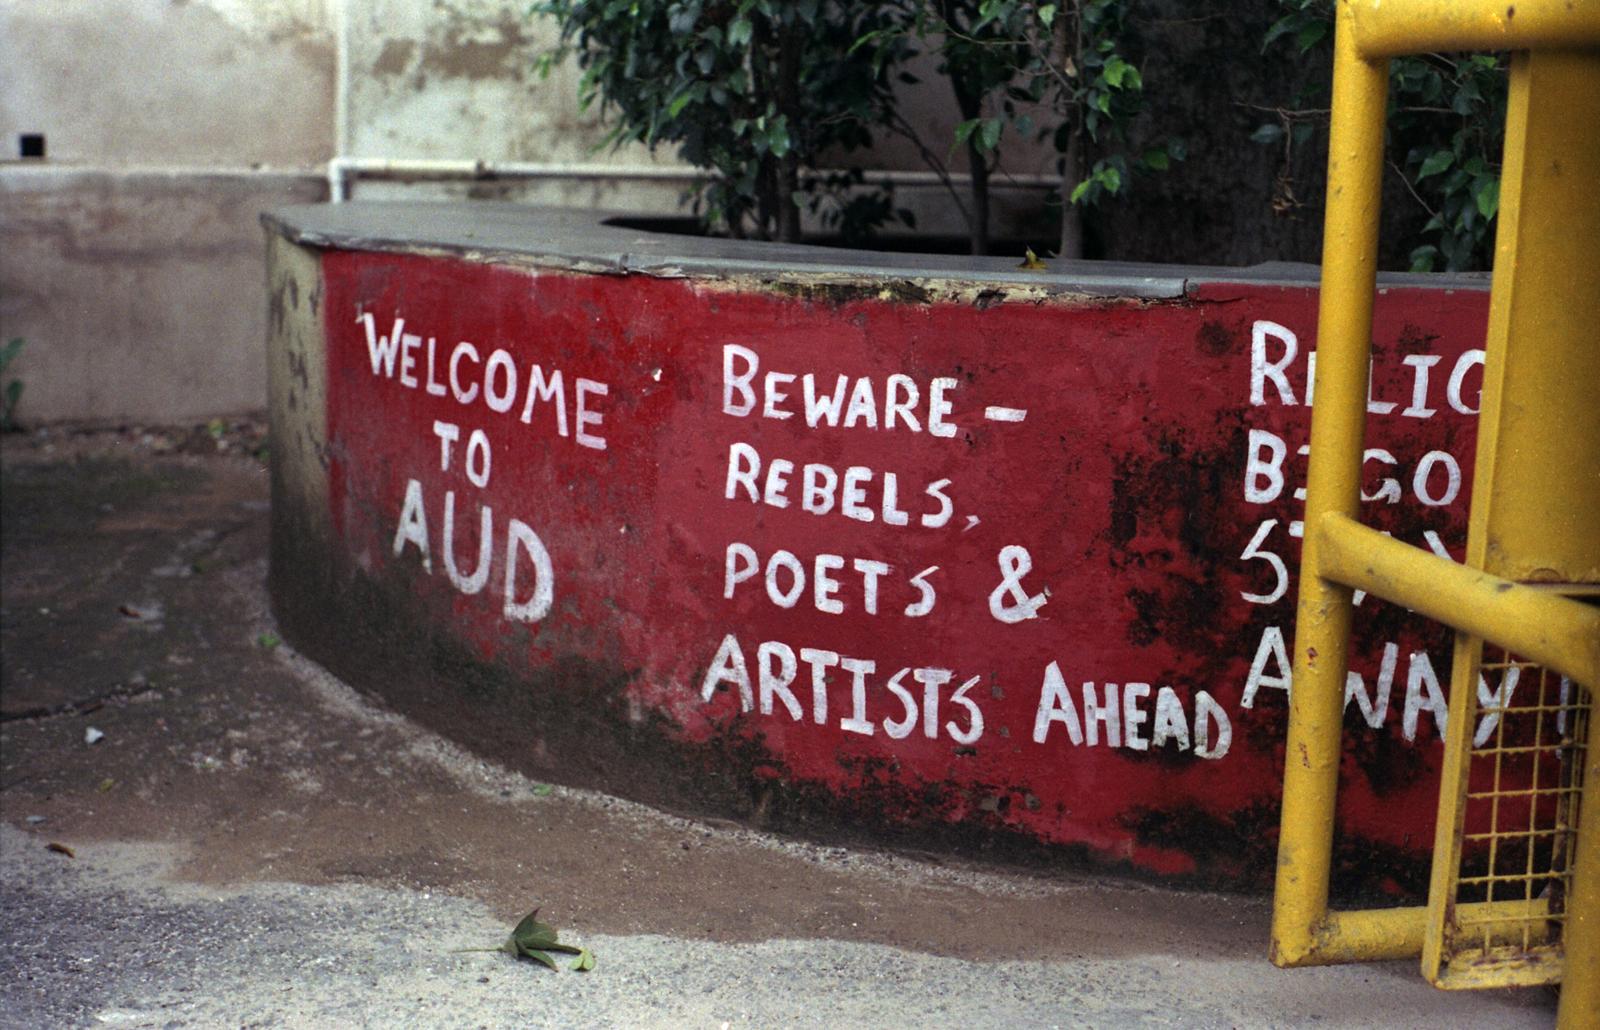 Welcome to AUD! Beware: Rebels, Poets & Artists Ahead